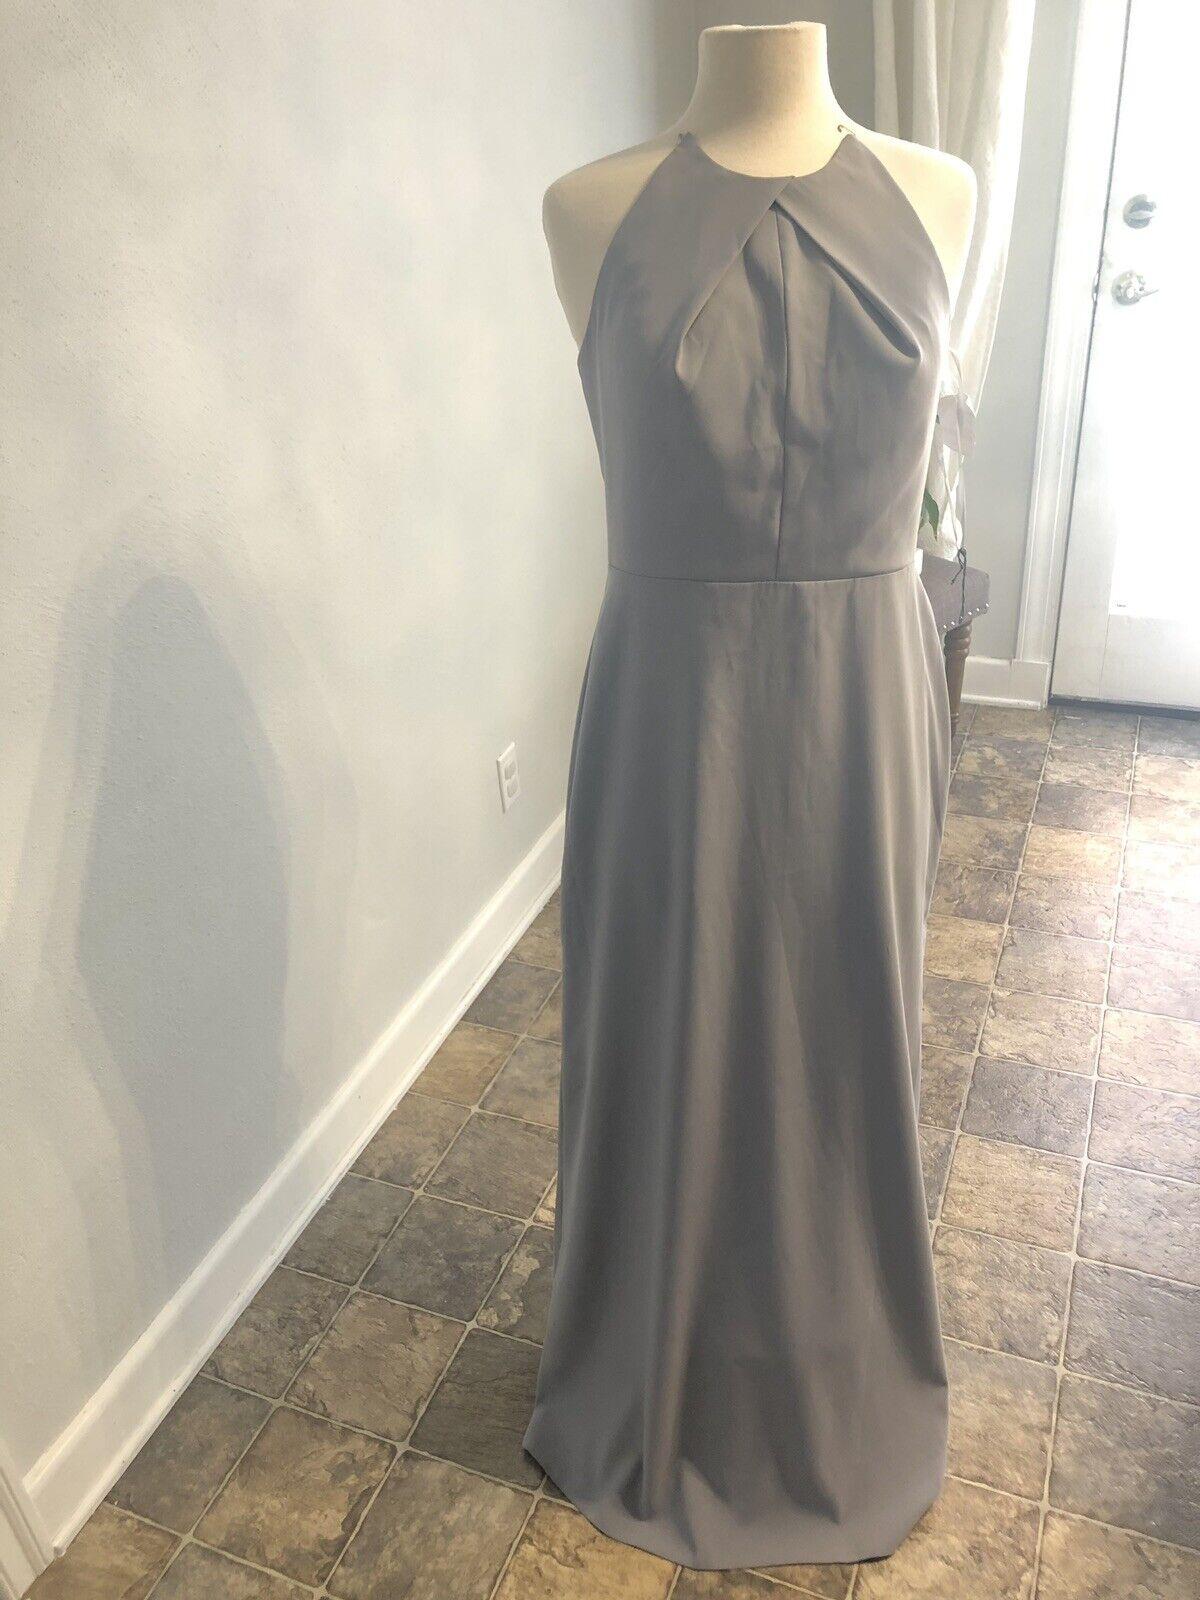 Lela ROSE LR227 Size 8 Color Platinum